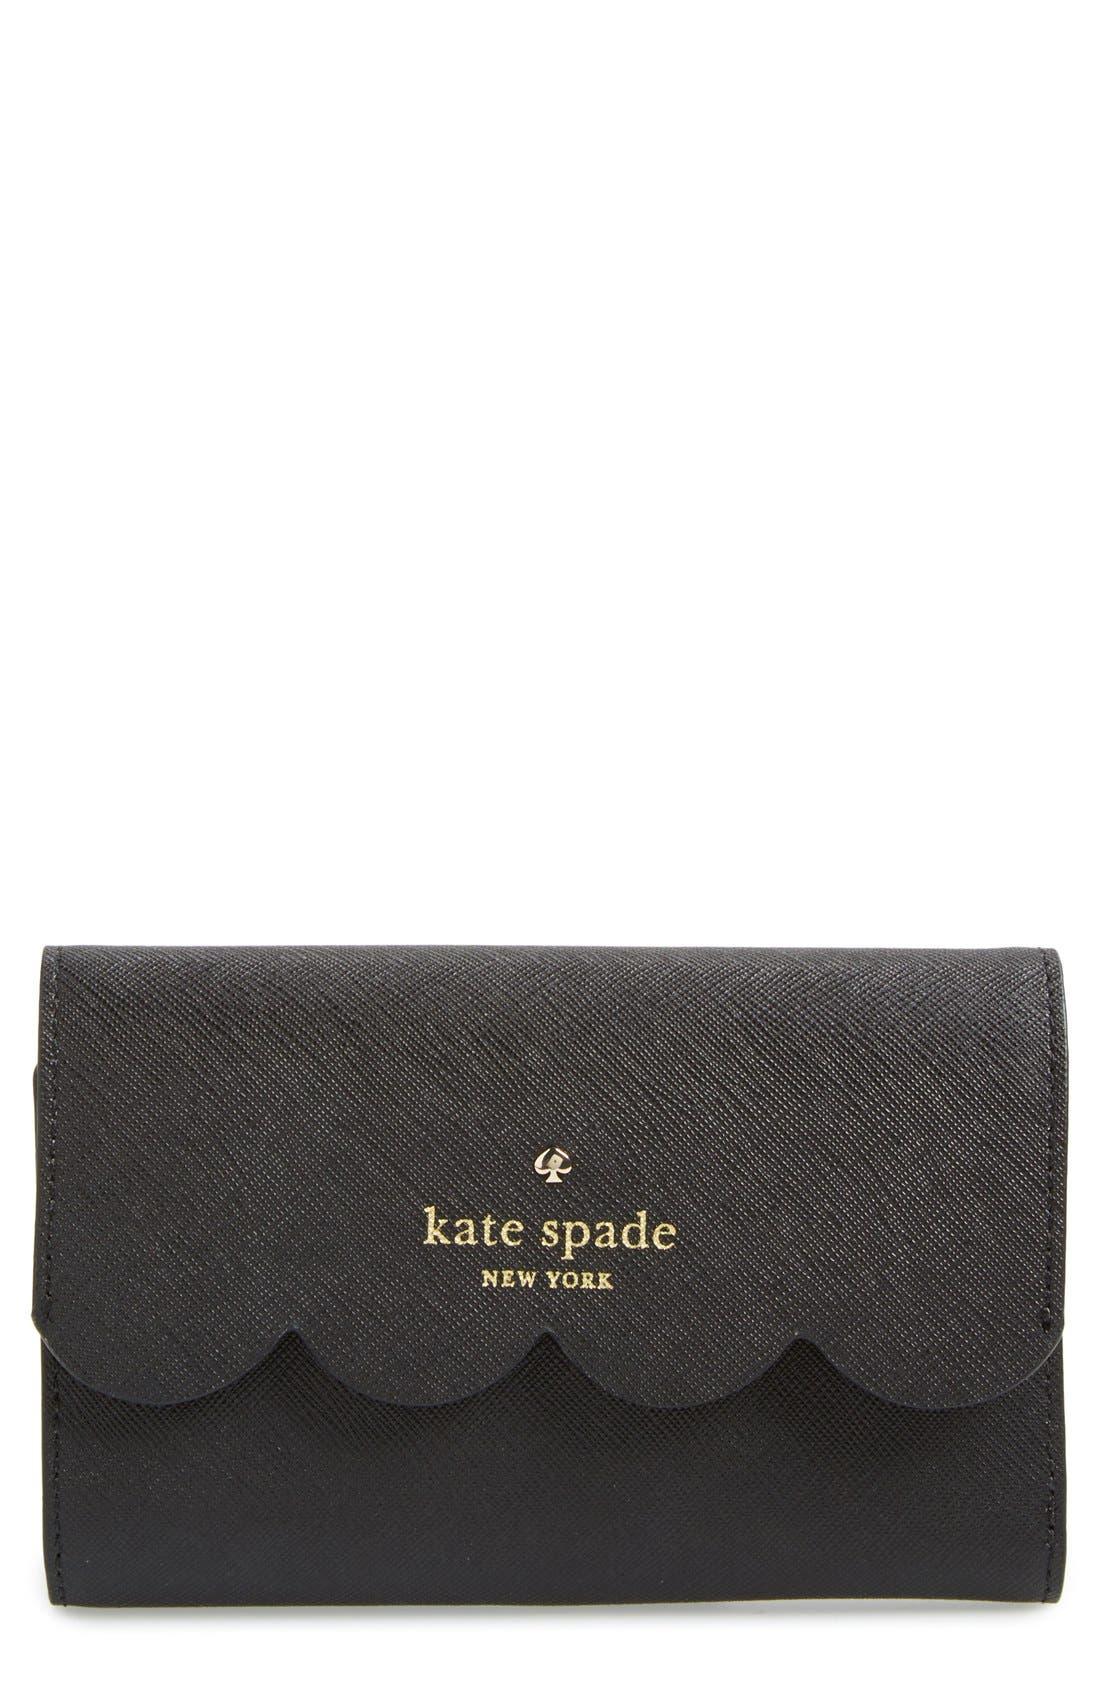 Alternate Image 1 Selected - kate spade new york 'lily avenue - kieran' wallet